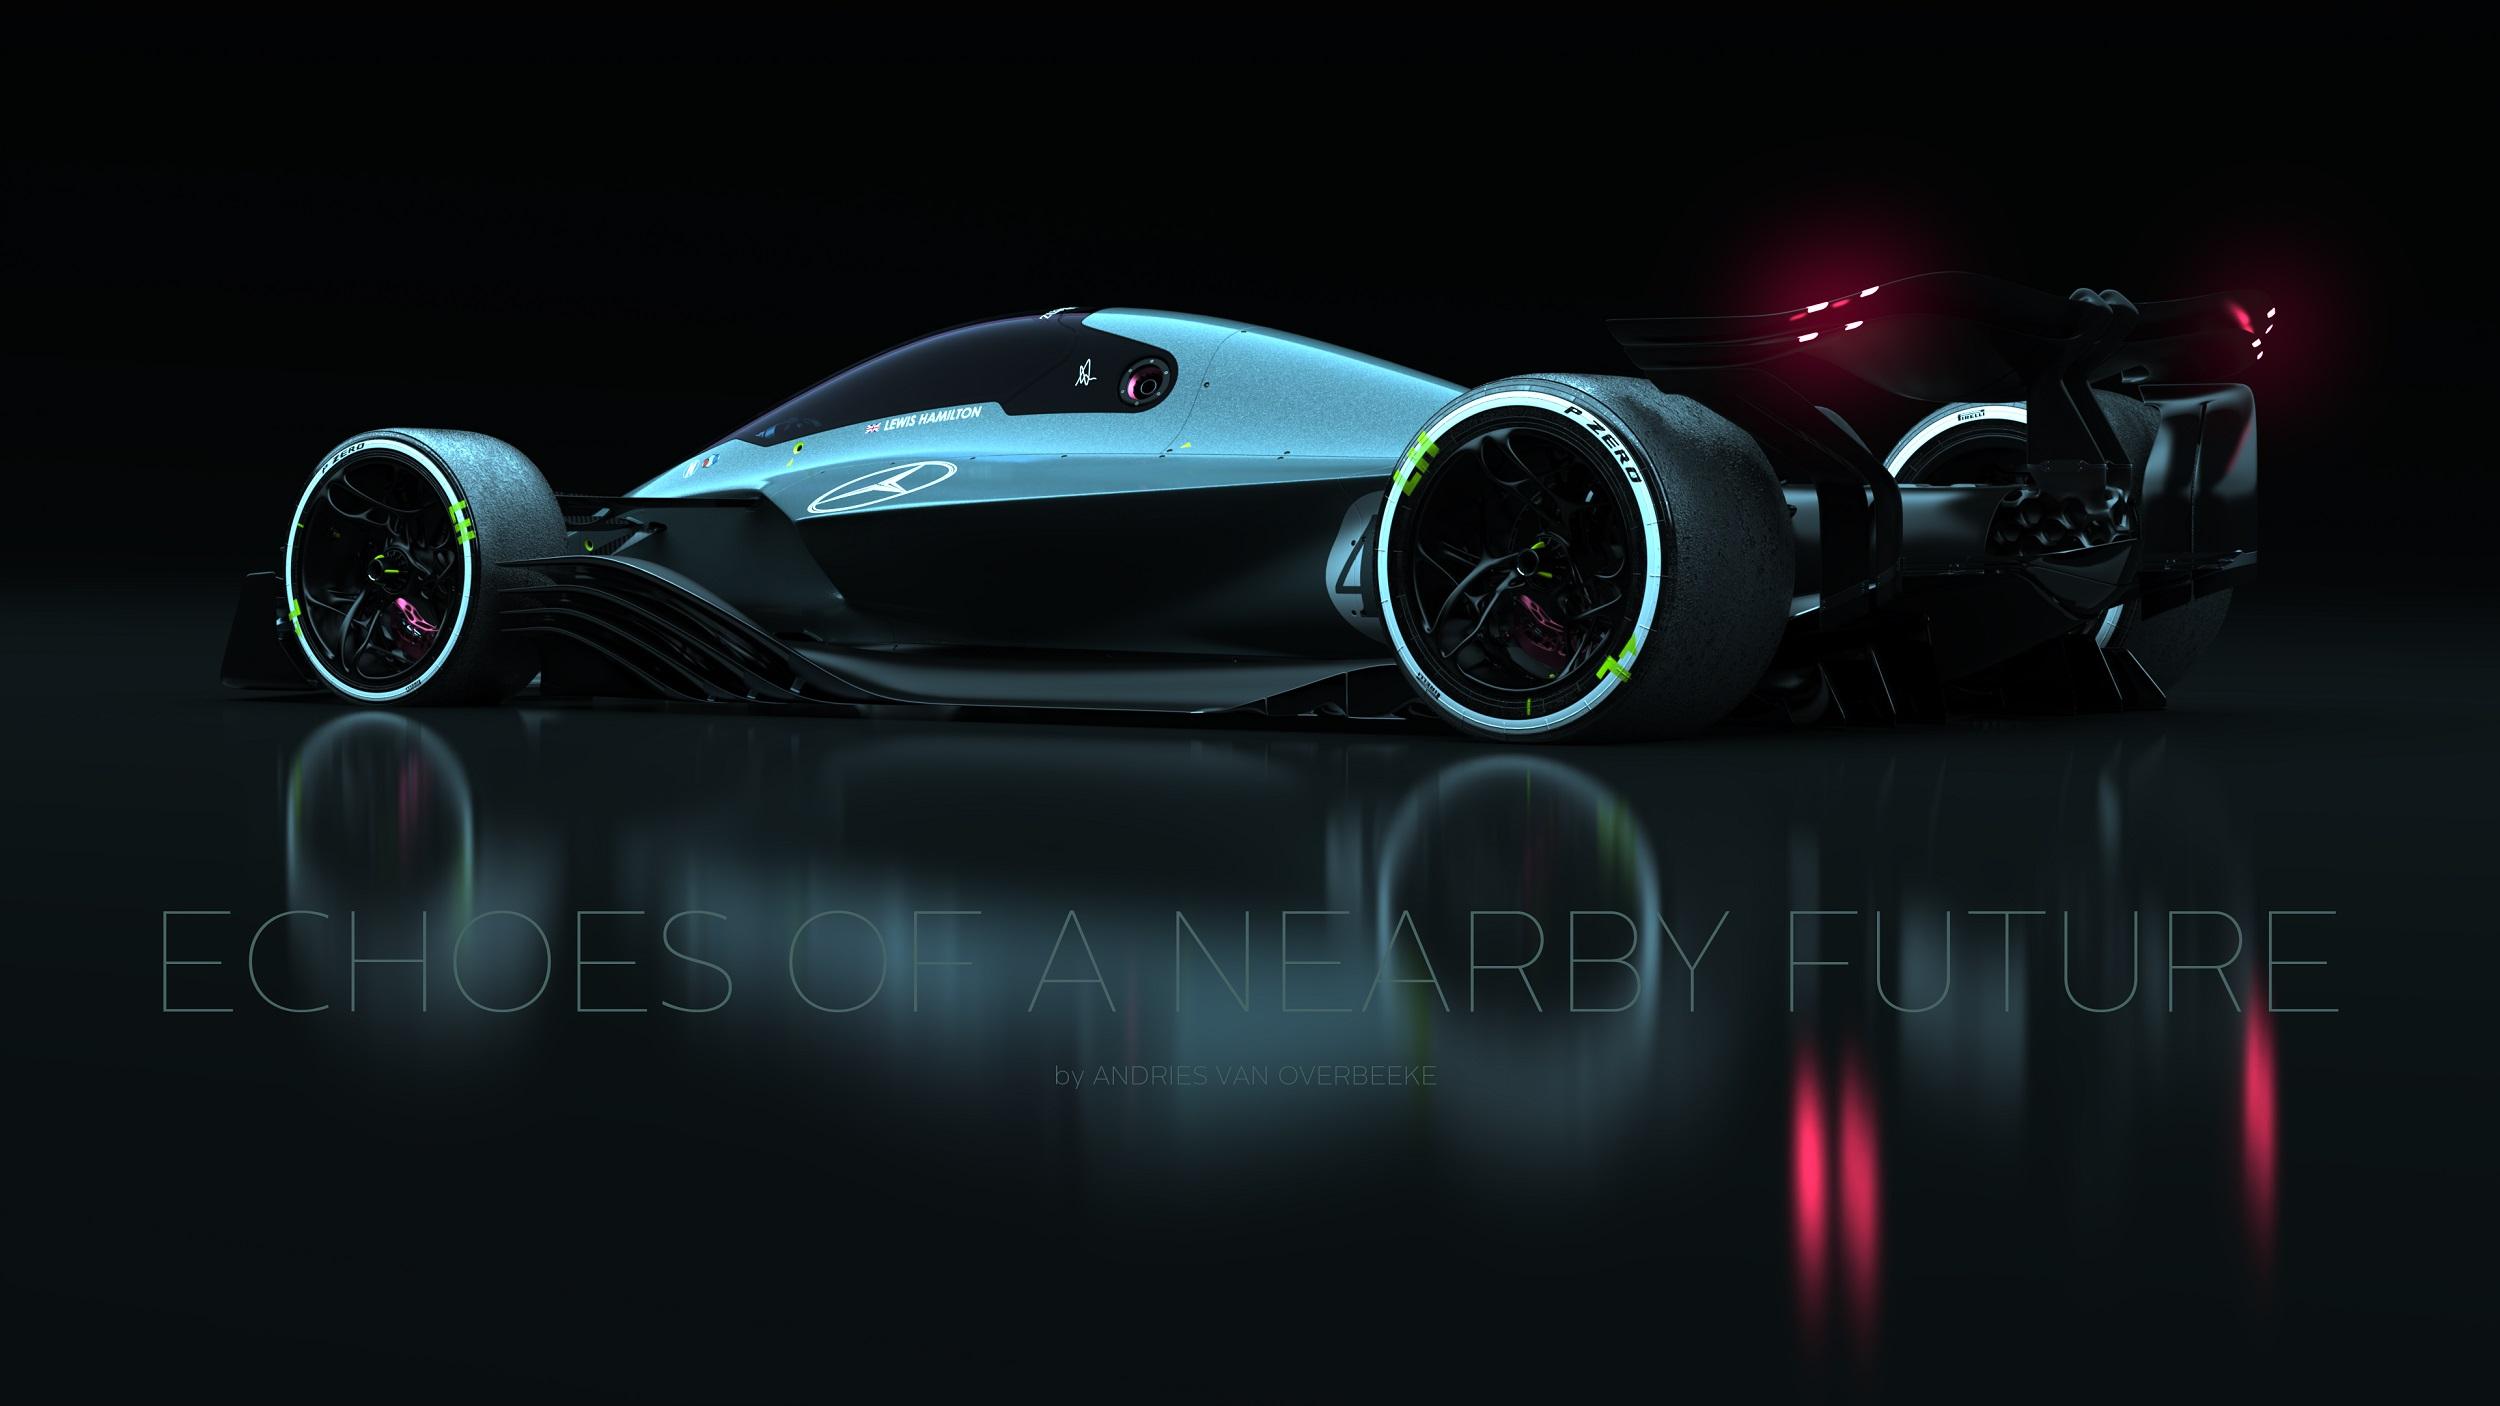 Mercedes-AMG Petronas F1 Rendering